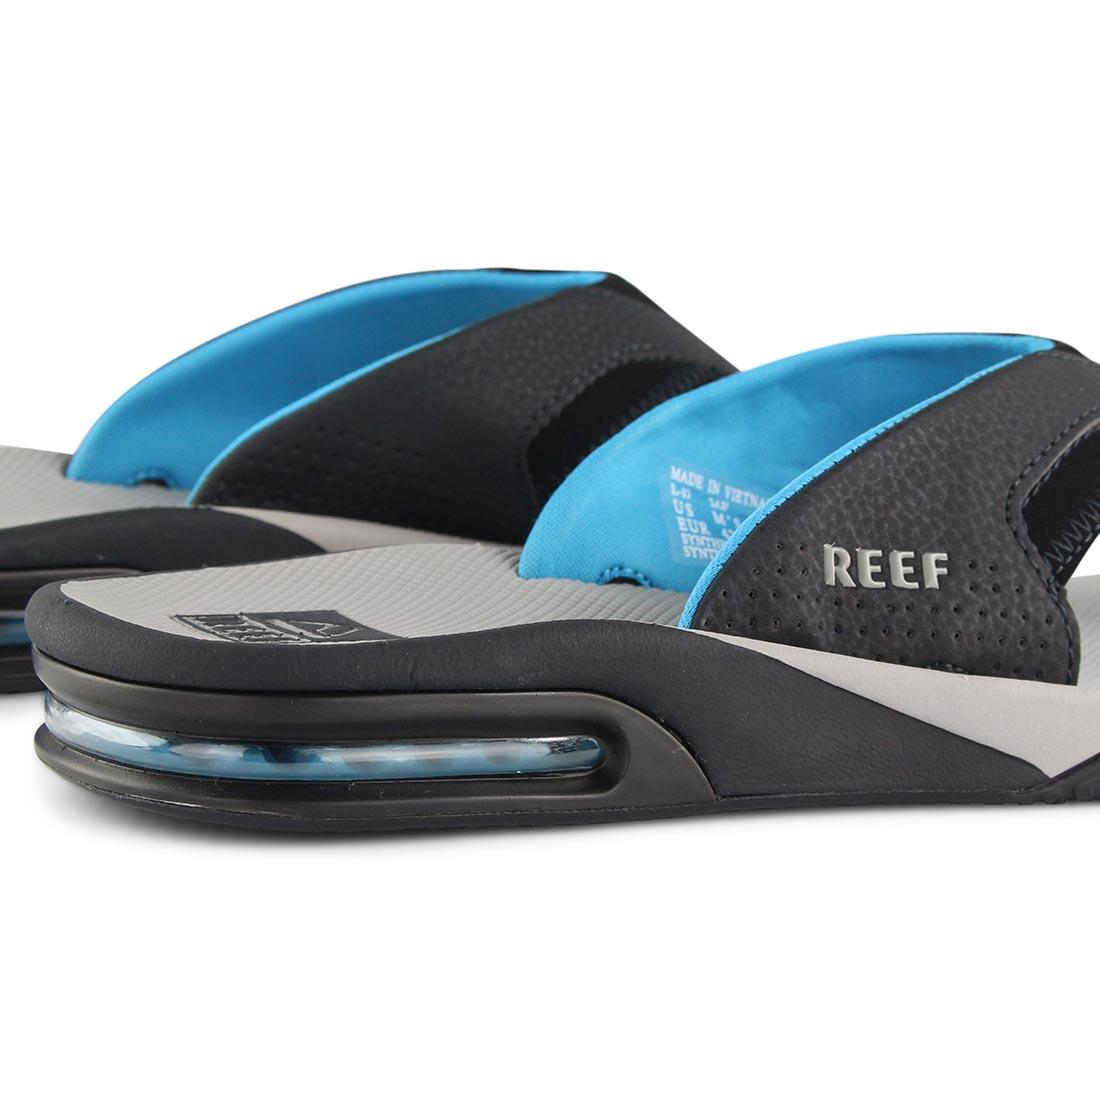 e8483c1be22f Reef Fanning Sandals - Light Grey   Blue